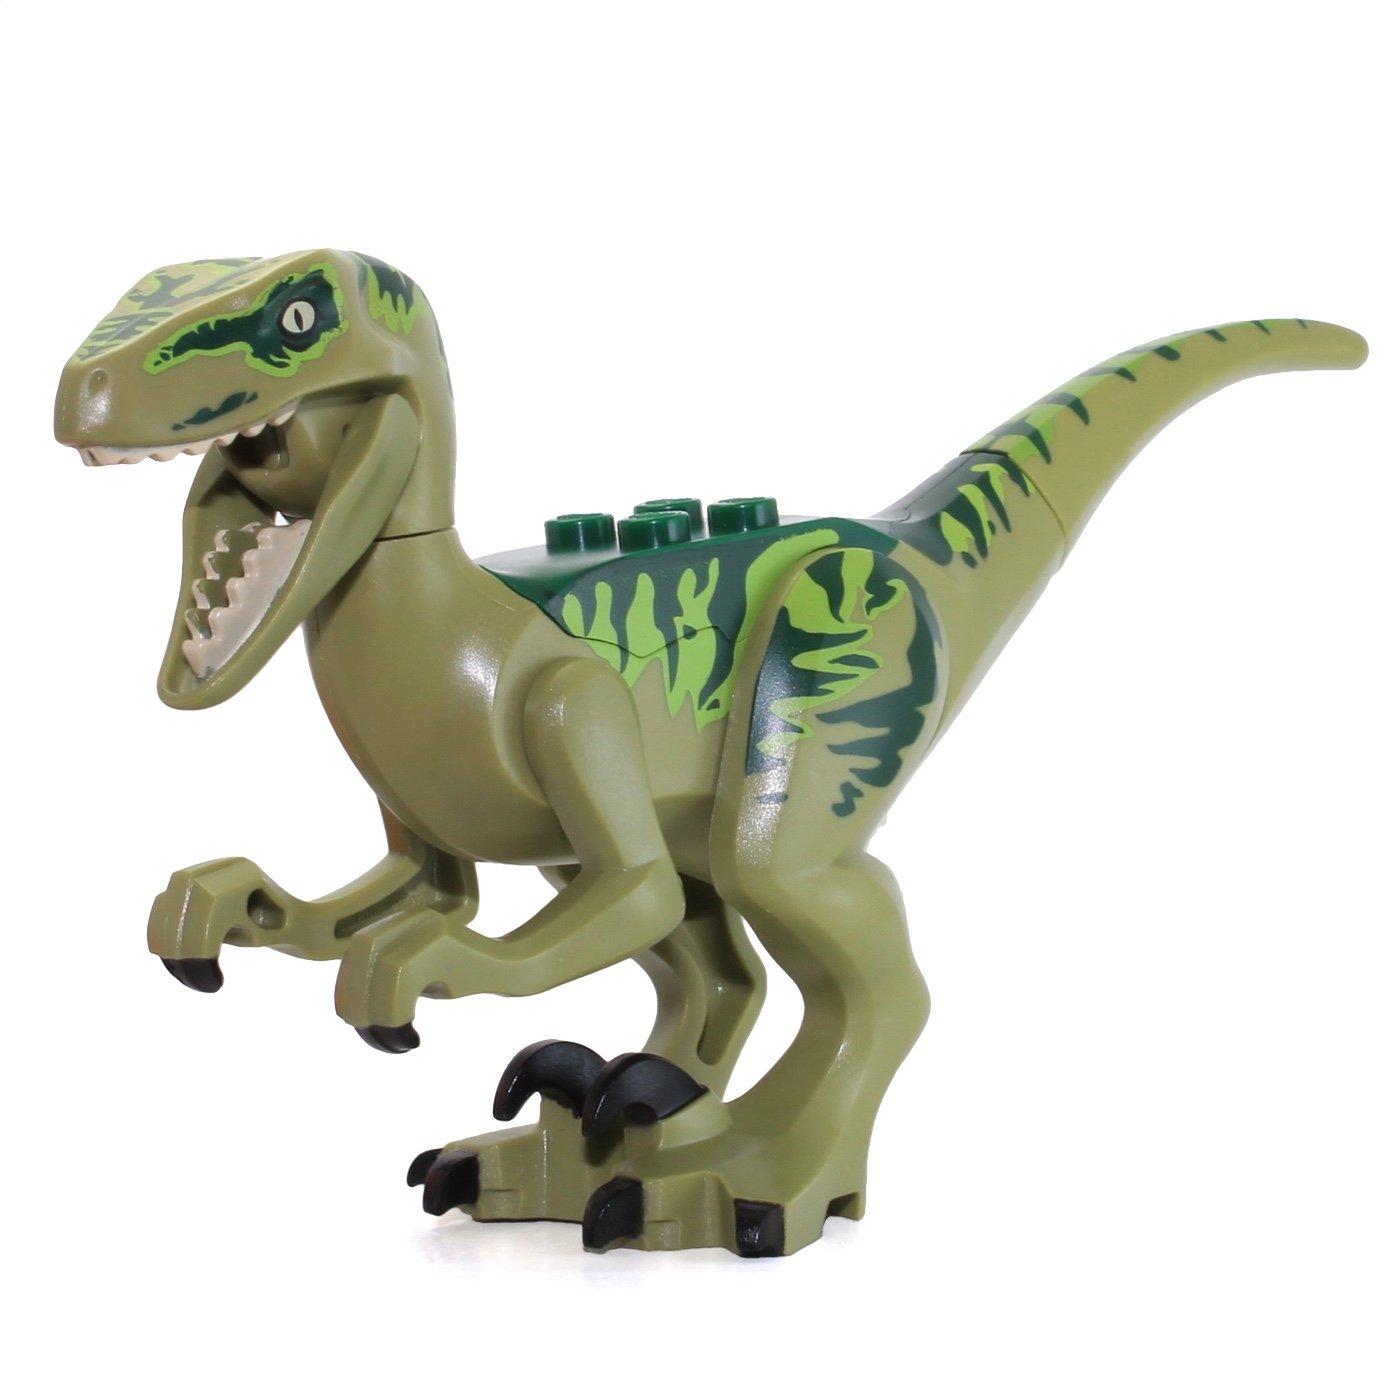 LEGO Dino Raptor Dinosaur Minifigure günstig